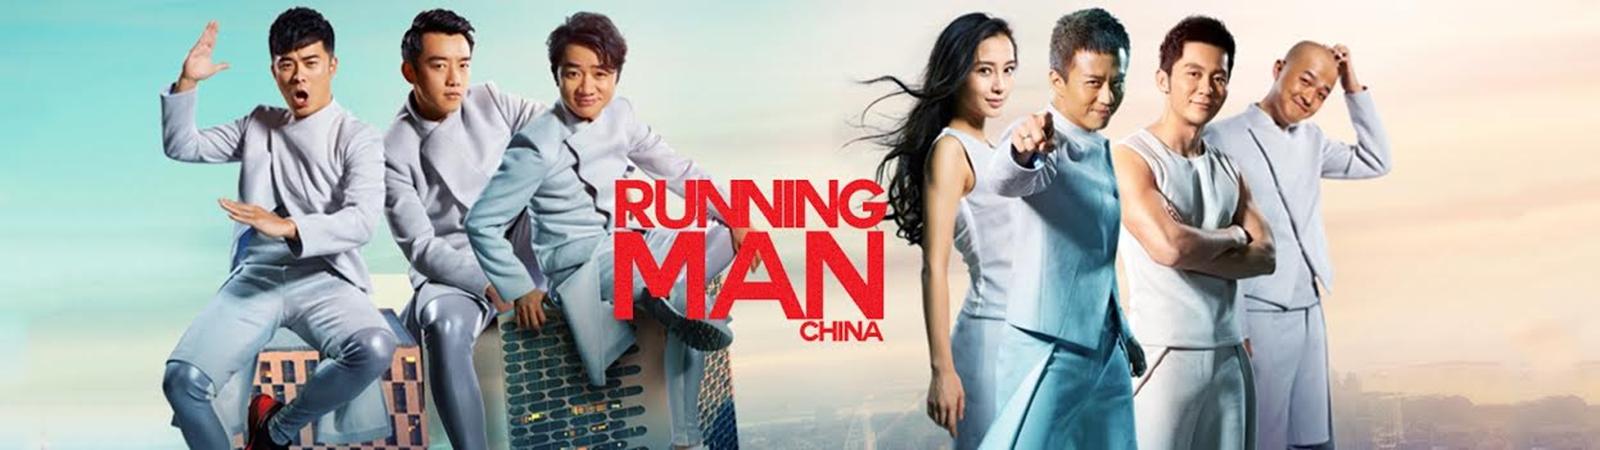 Running Man Bản Trung Quốc 2015